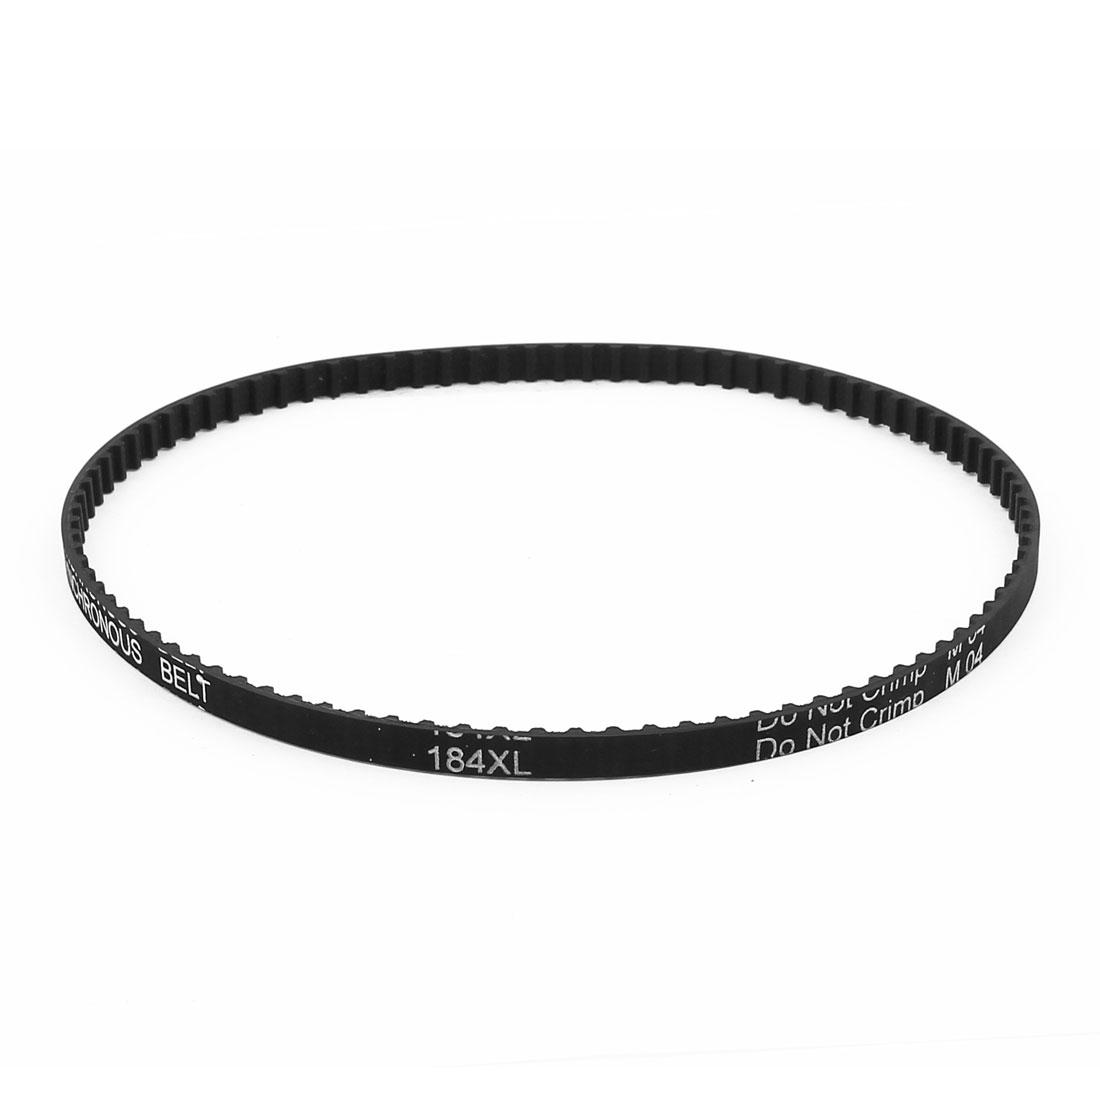 184XL 025 92 Teeth 6.4mm Width 467.36mm Pitch Length Timing Belt Black